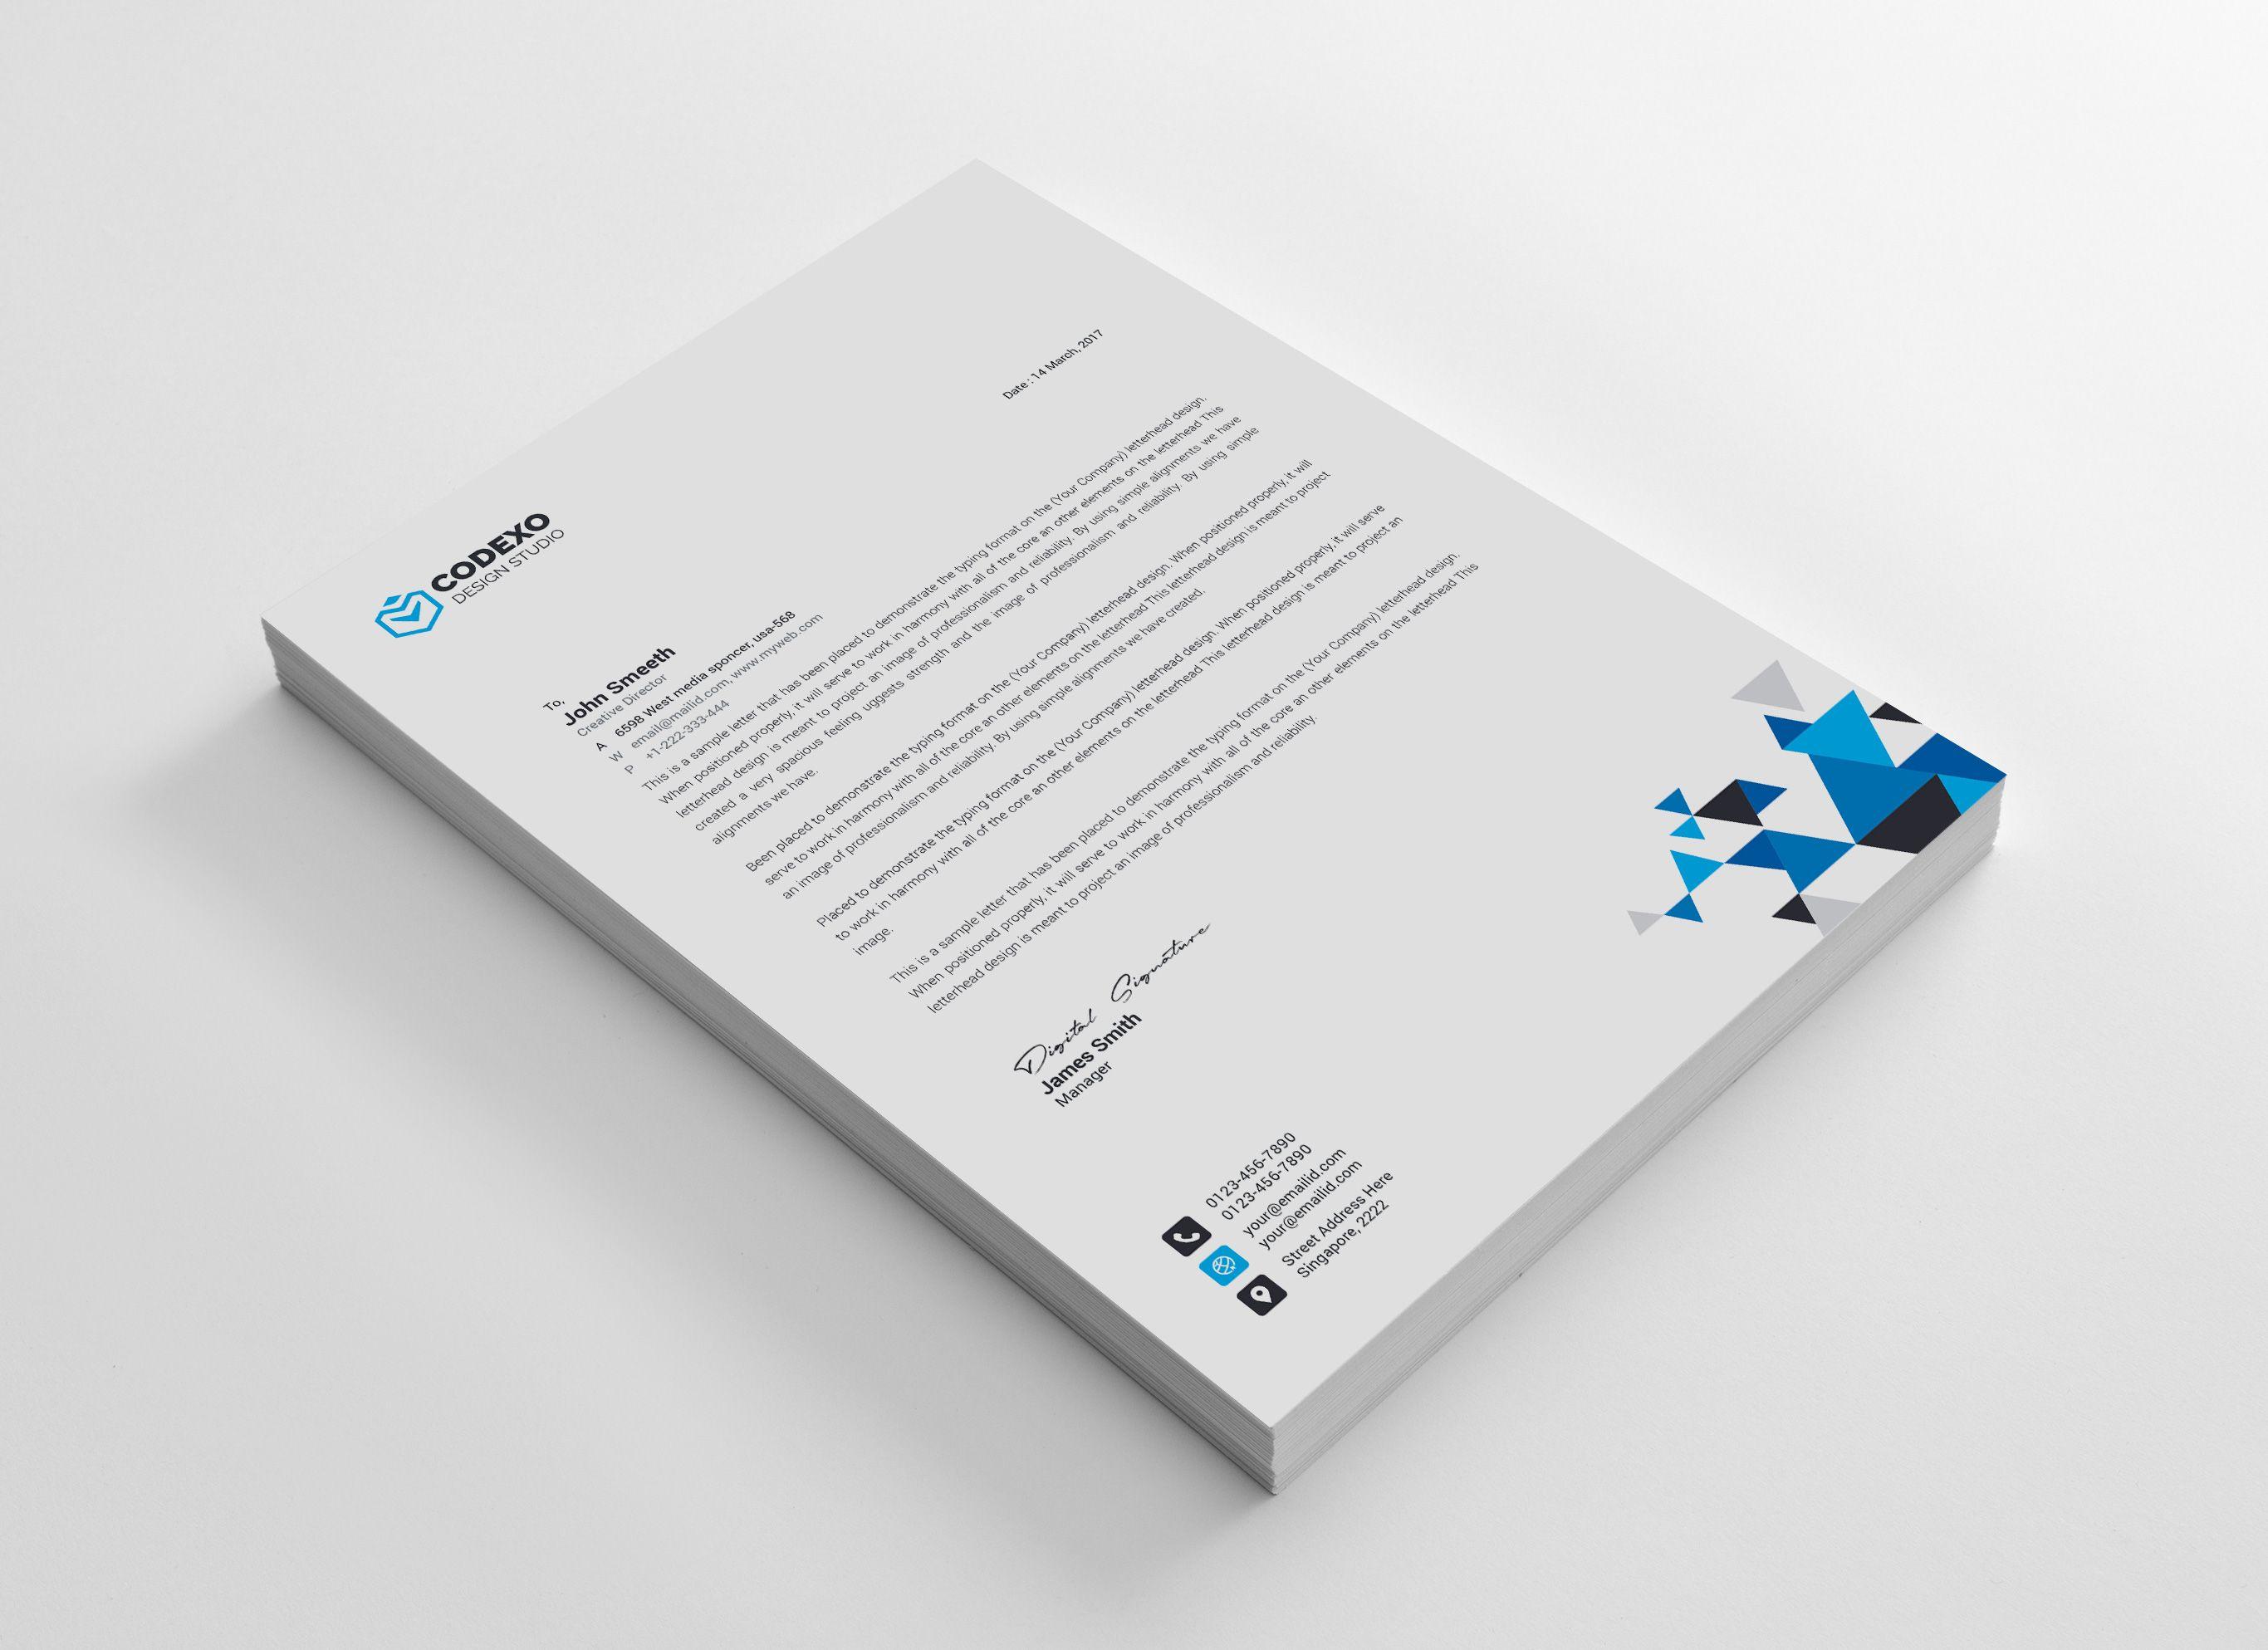 triangle professional corporate letterhead template good retail resume cv fresh graduate example substitute teacher skills